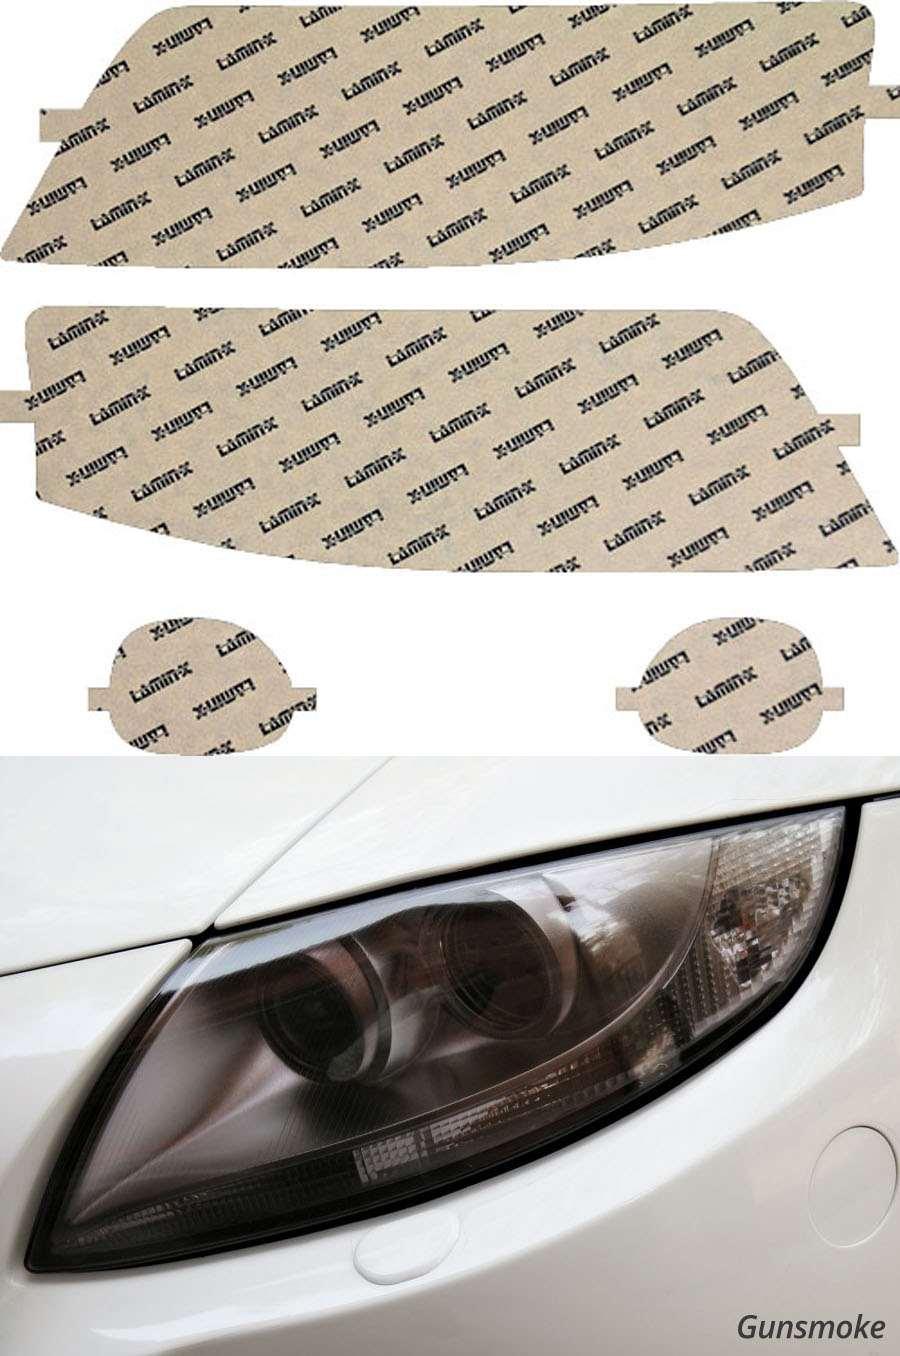 Audi Allroad 01-06 Gunsmoke Headlight Covers Lamin-X A005G